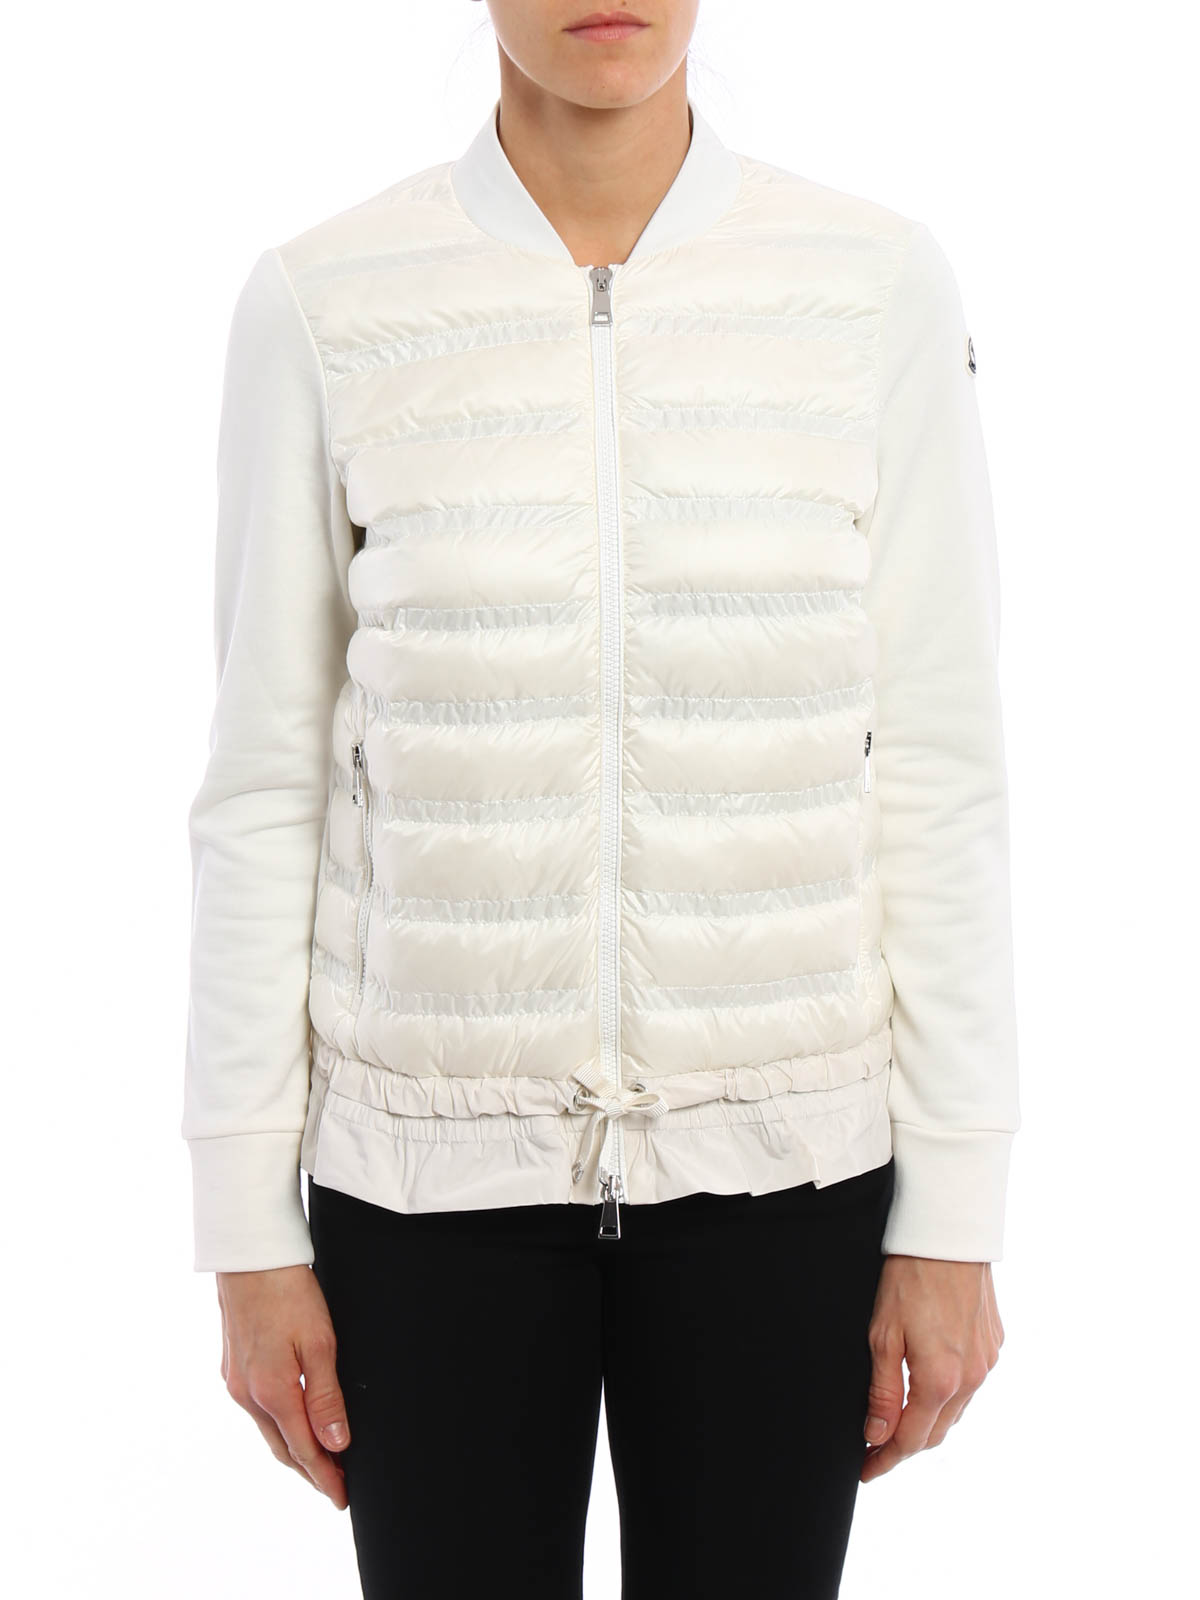 Moncler - Sweat-Shirts Et Pulls Blanc - Sweatshirts   Pulls - C1 093 ... b9f93dbce5e